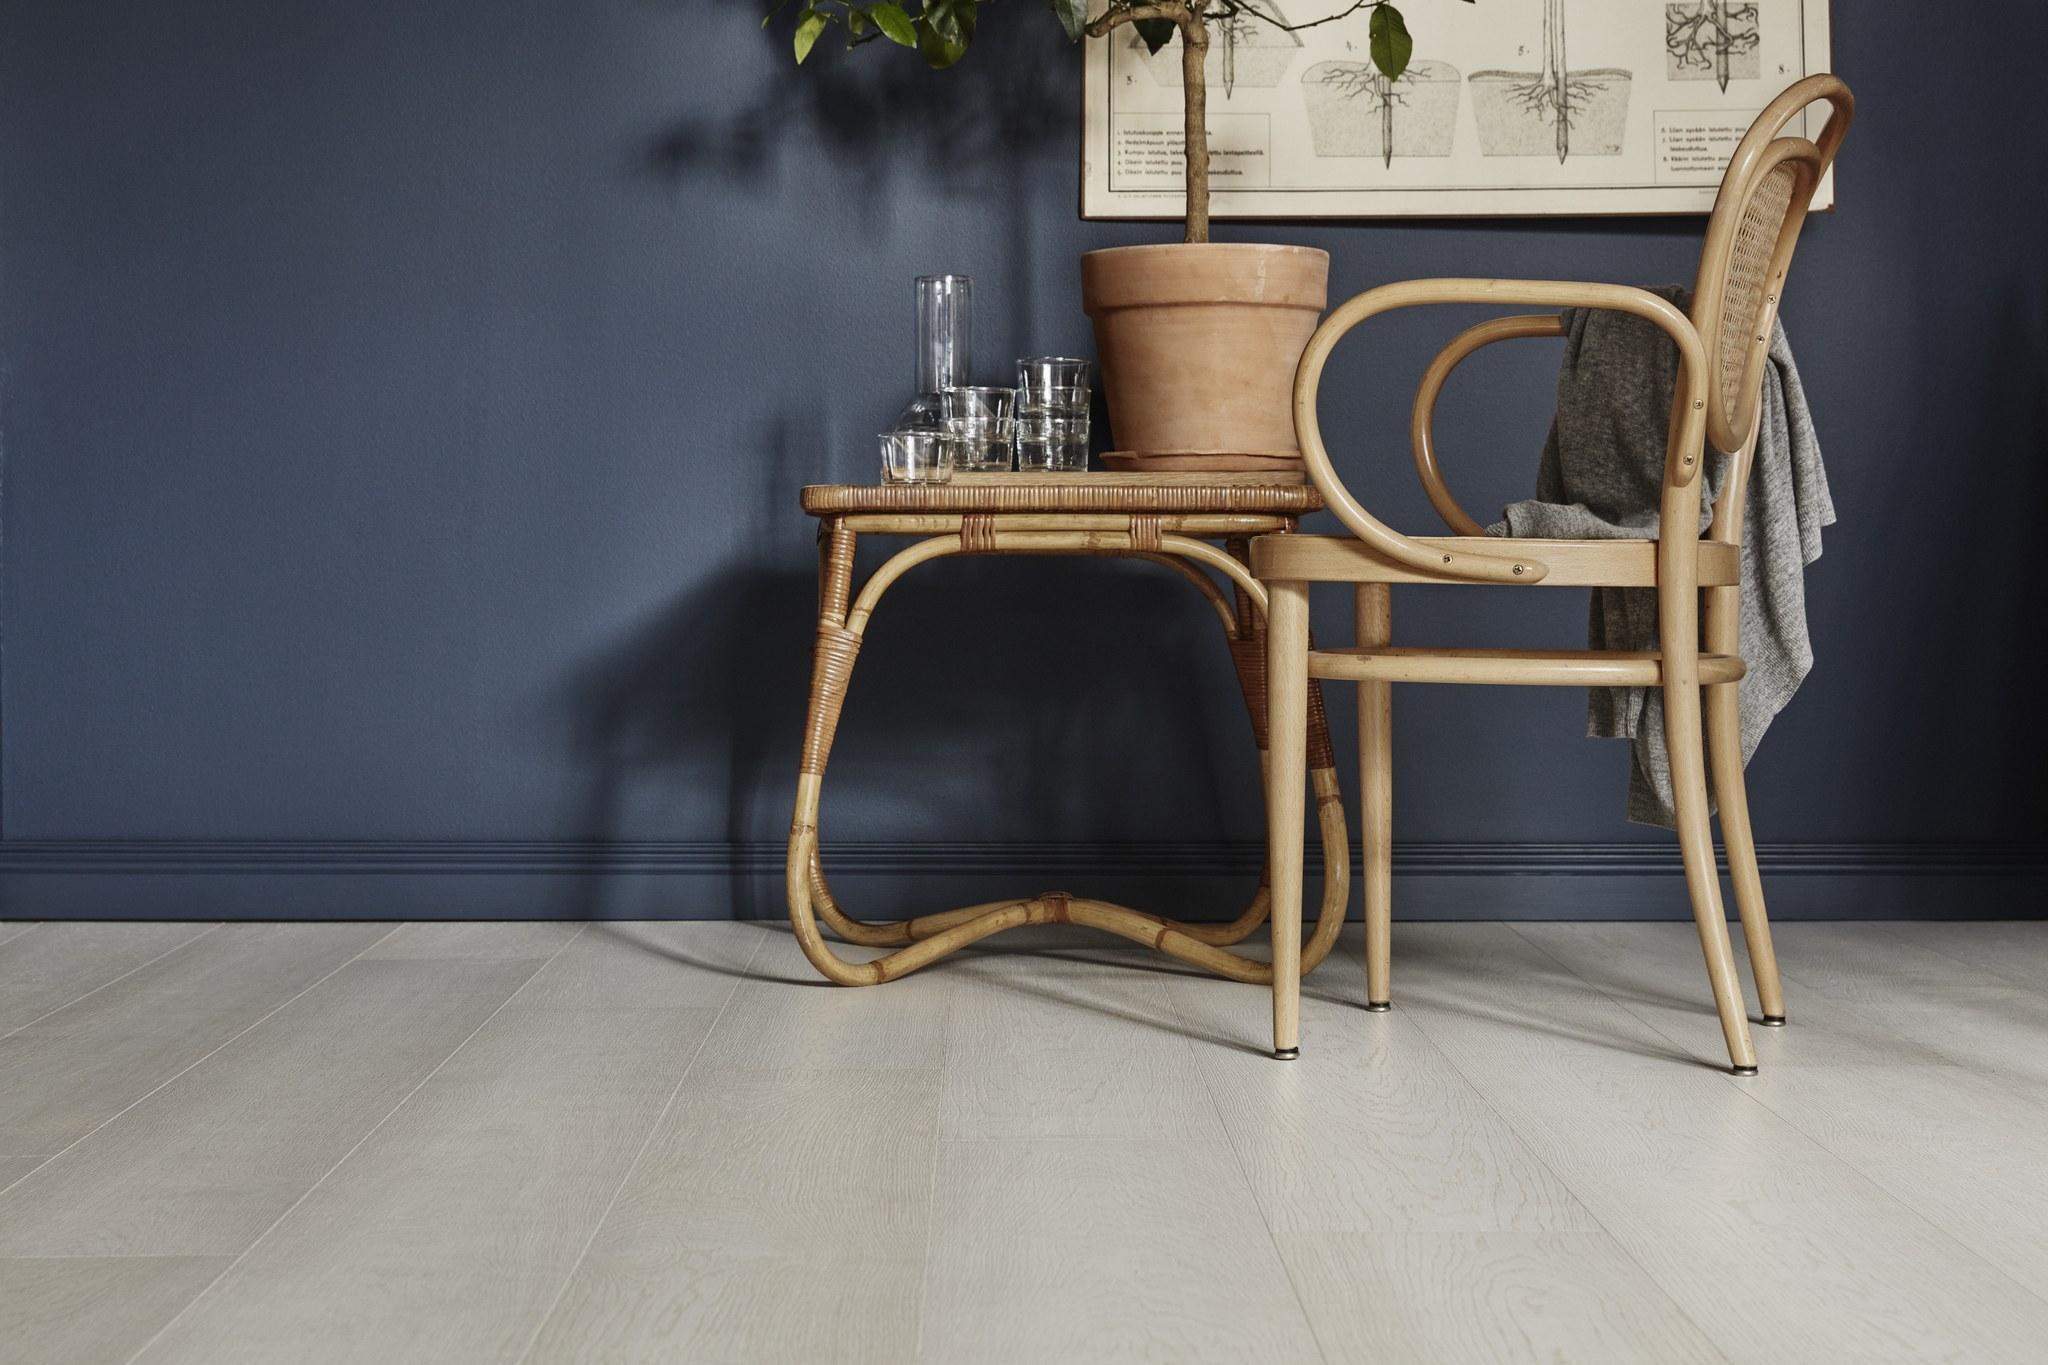 Timberwise parketti puulattia wooden floor parquet Tammi Oak Antarctis